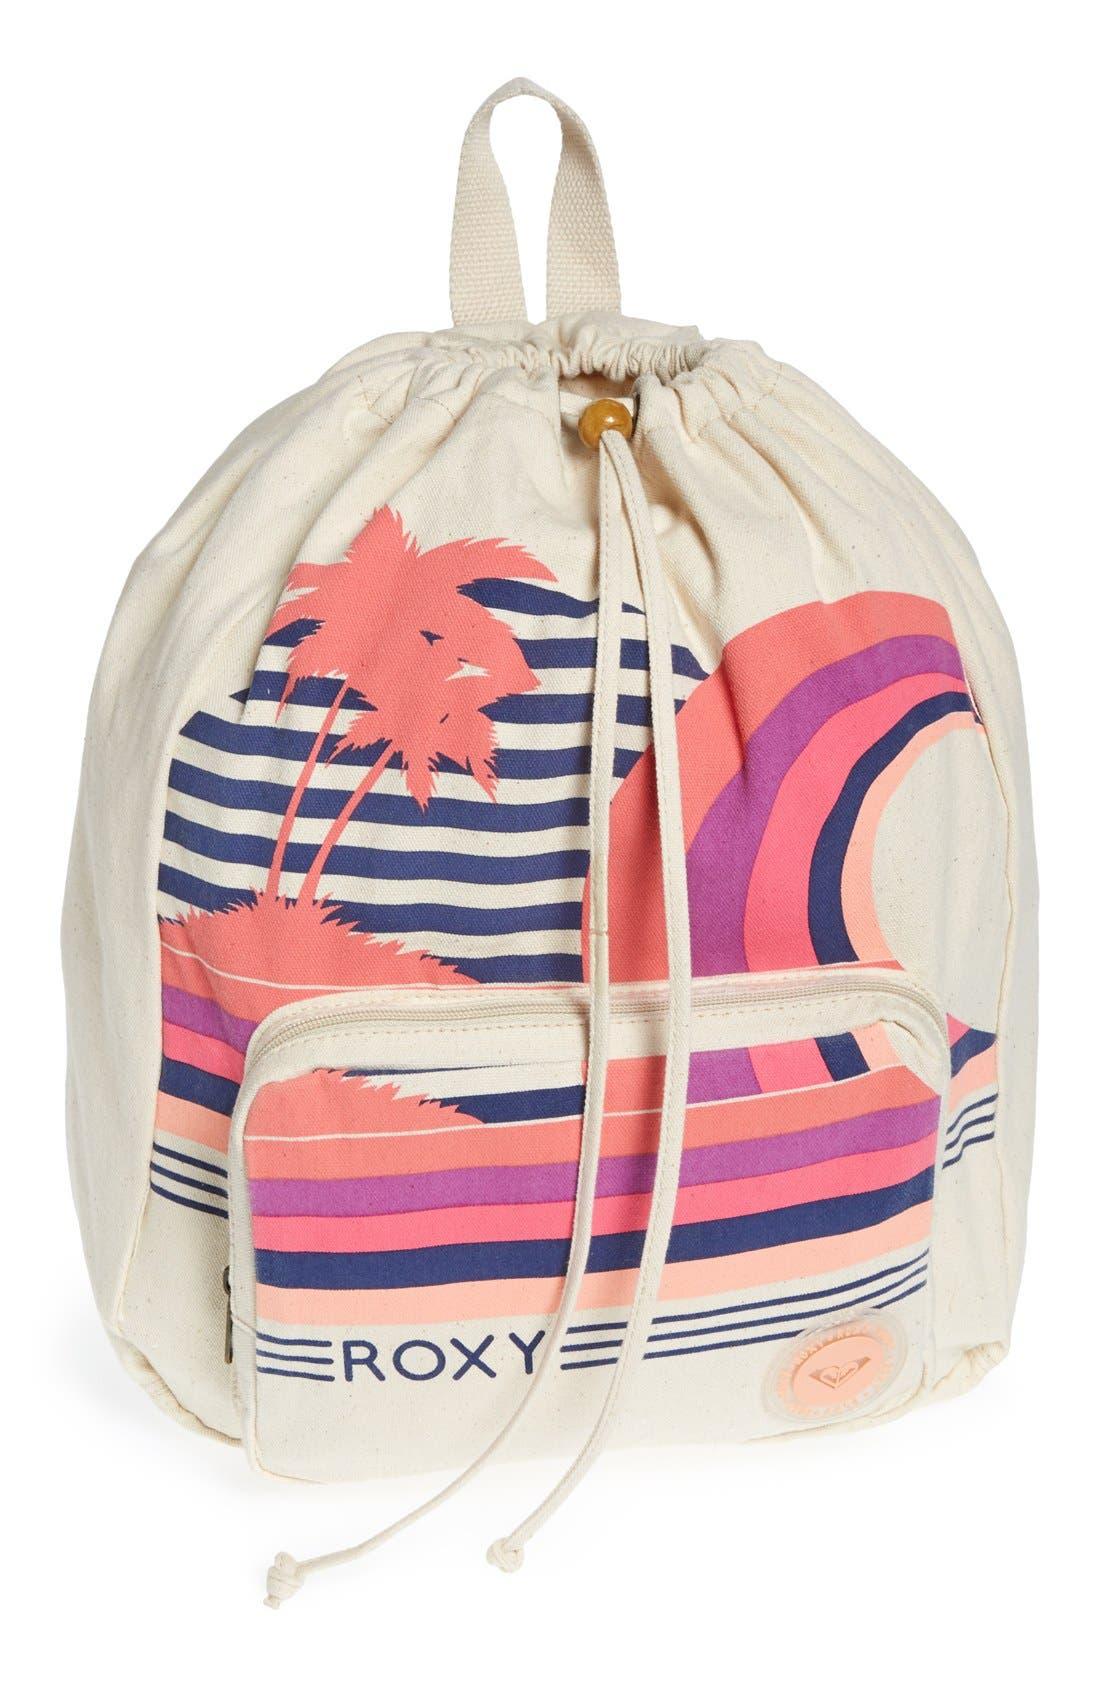 Alternate Image 1 Selected - Roxy 'Flybird' Drawstring Backpack (Girls)